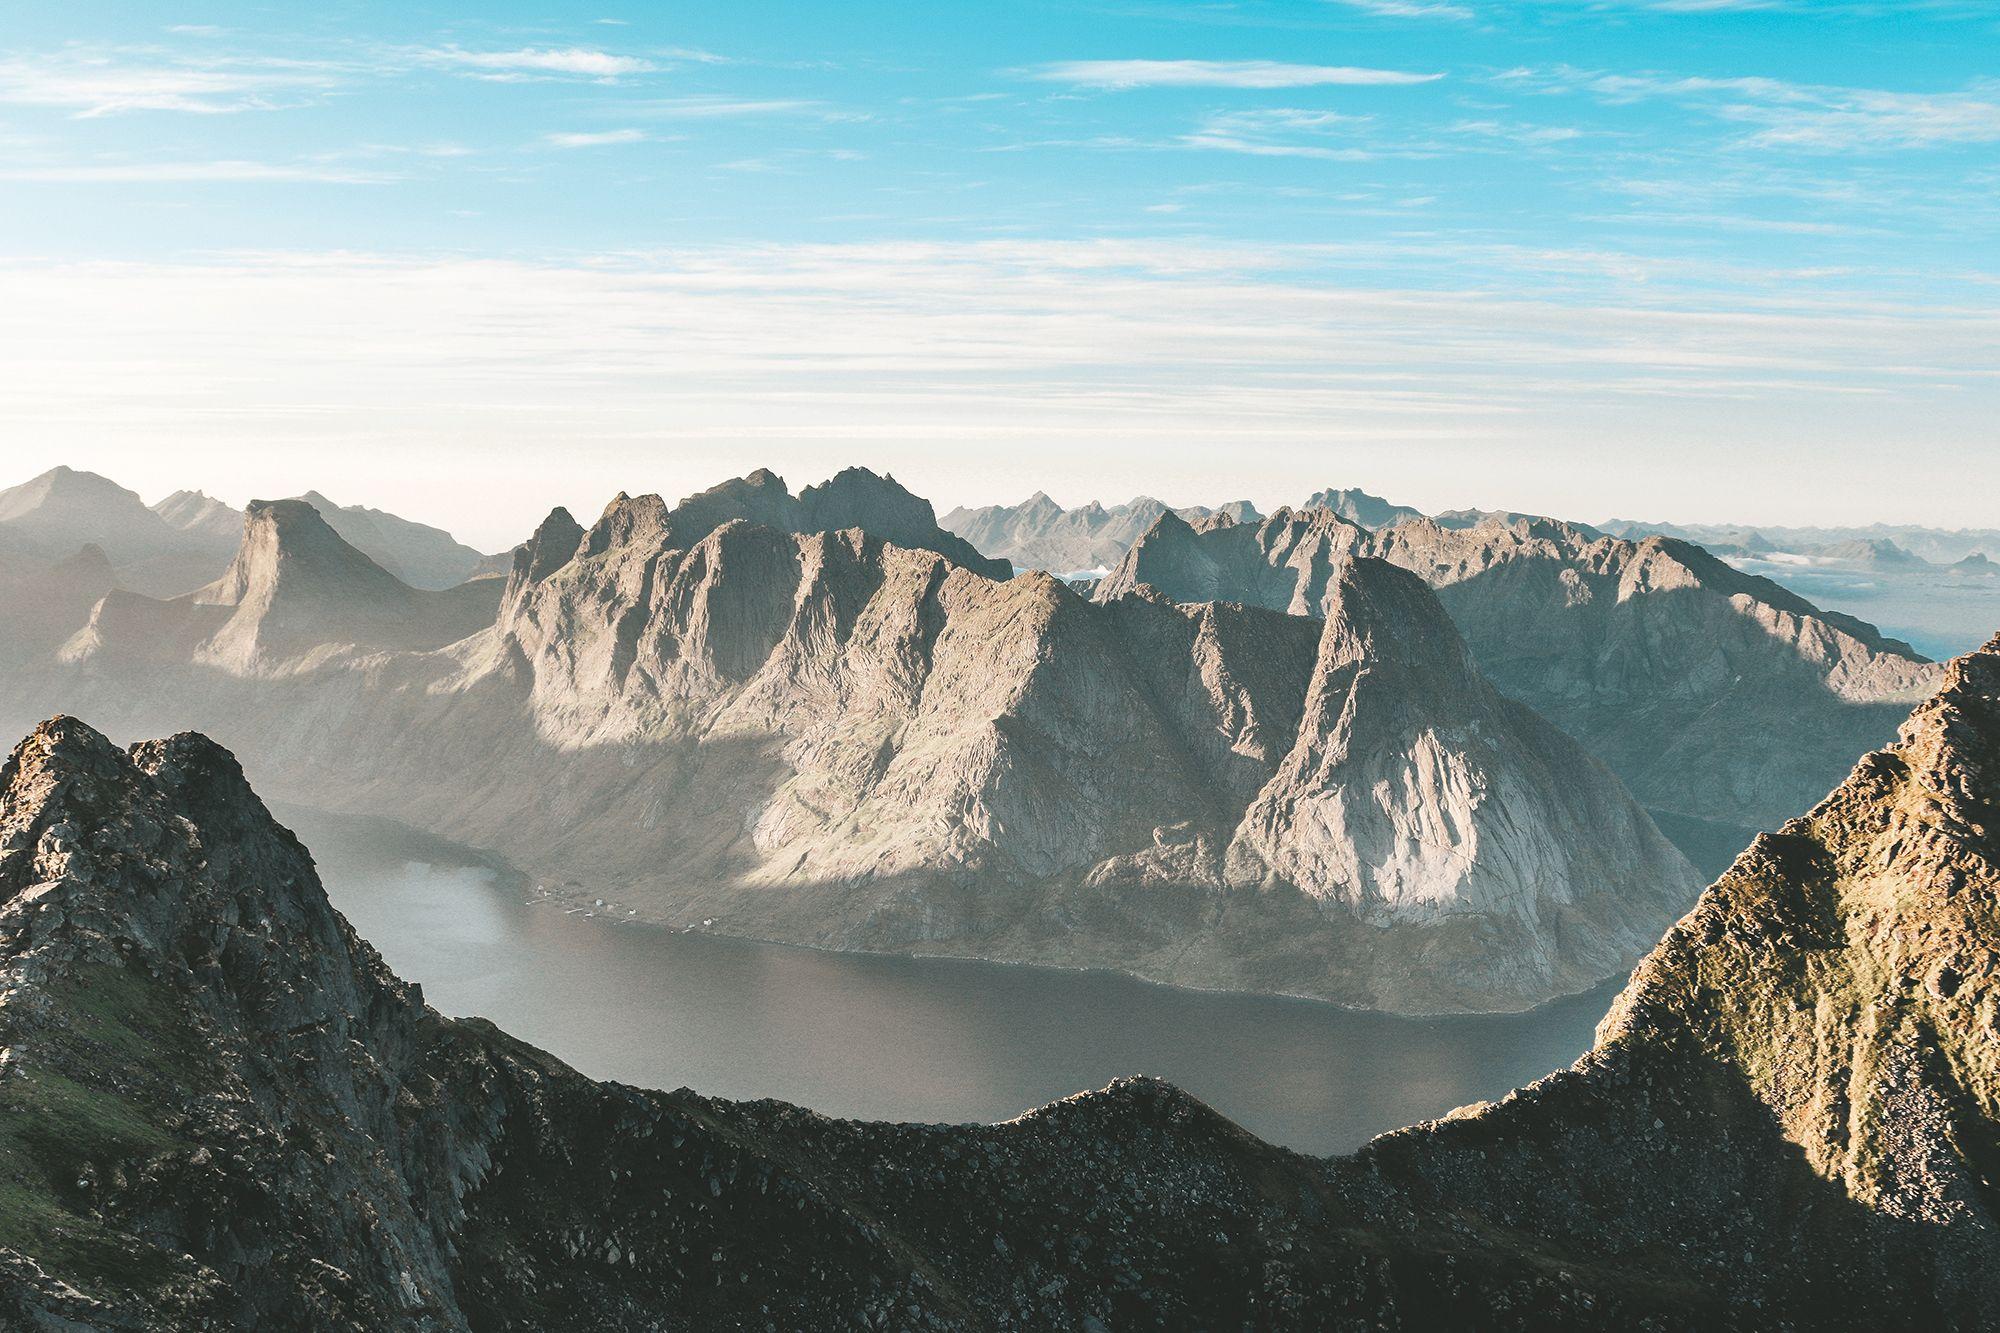 Вершина Мюнкен в Норвегии